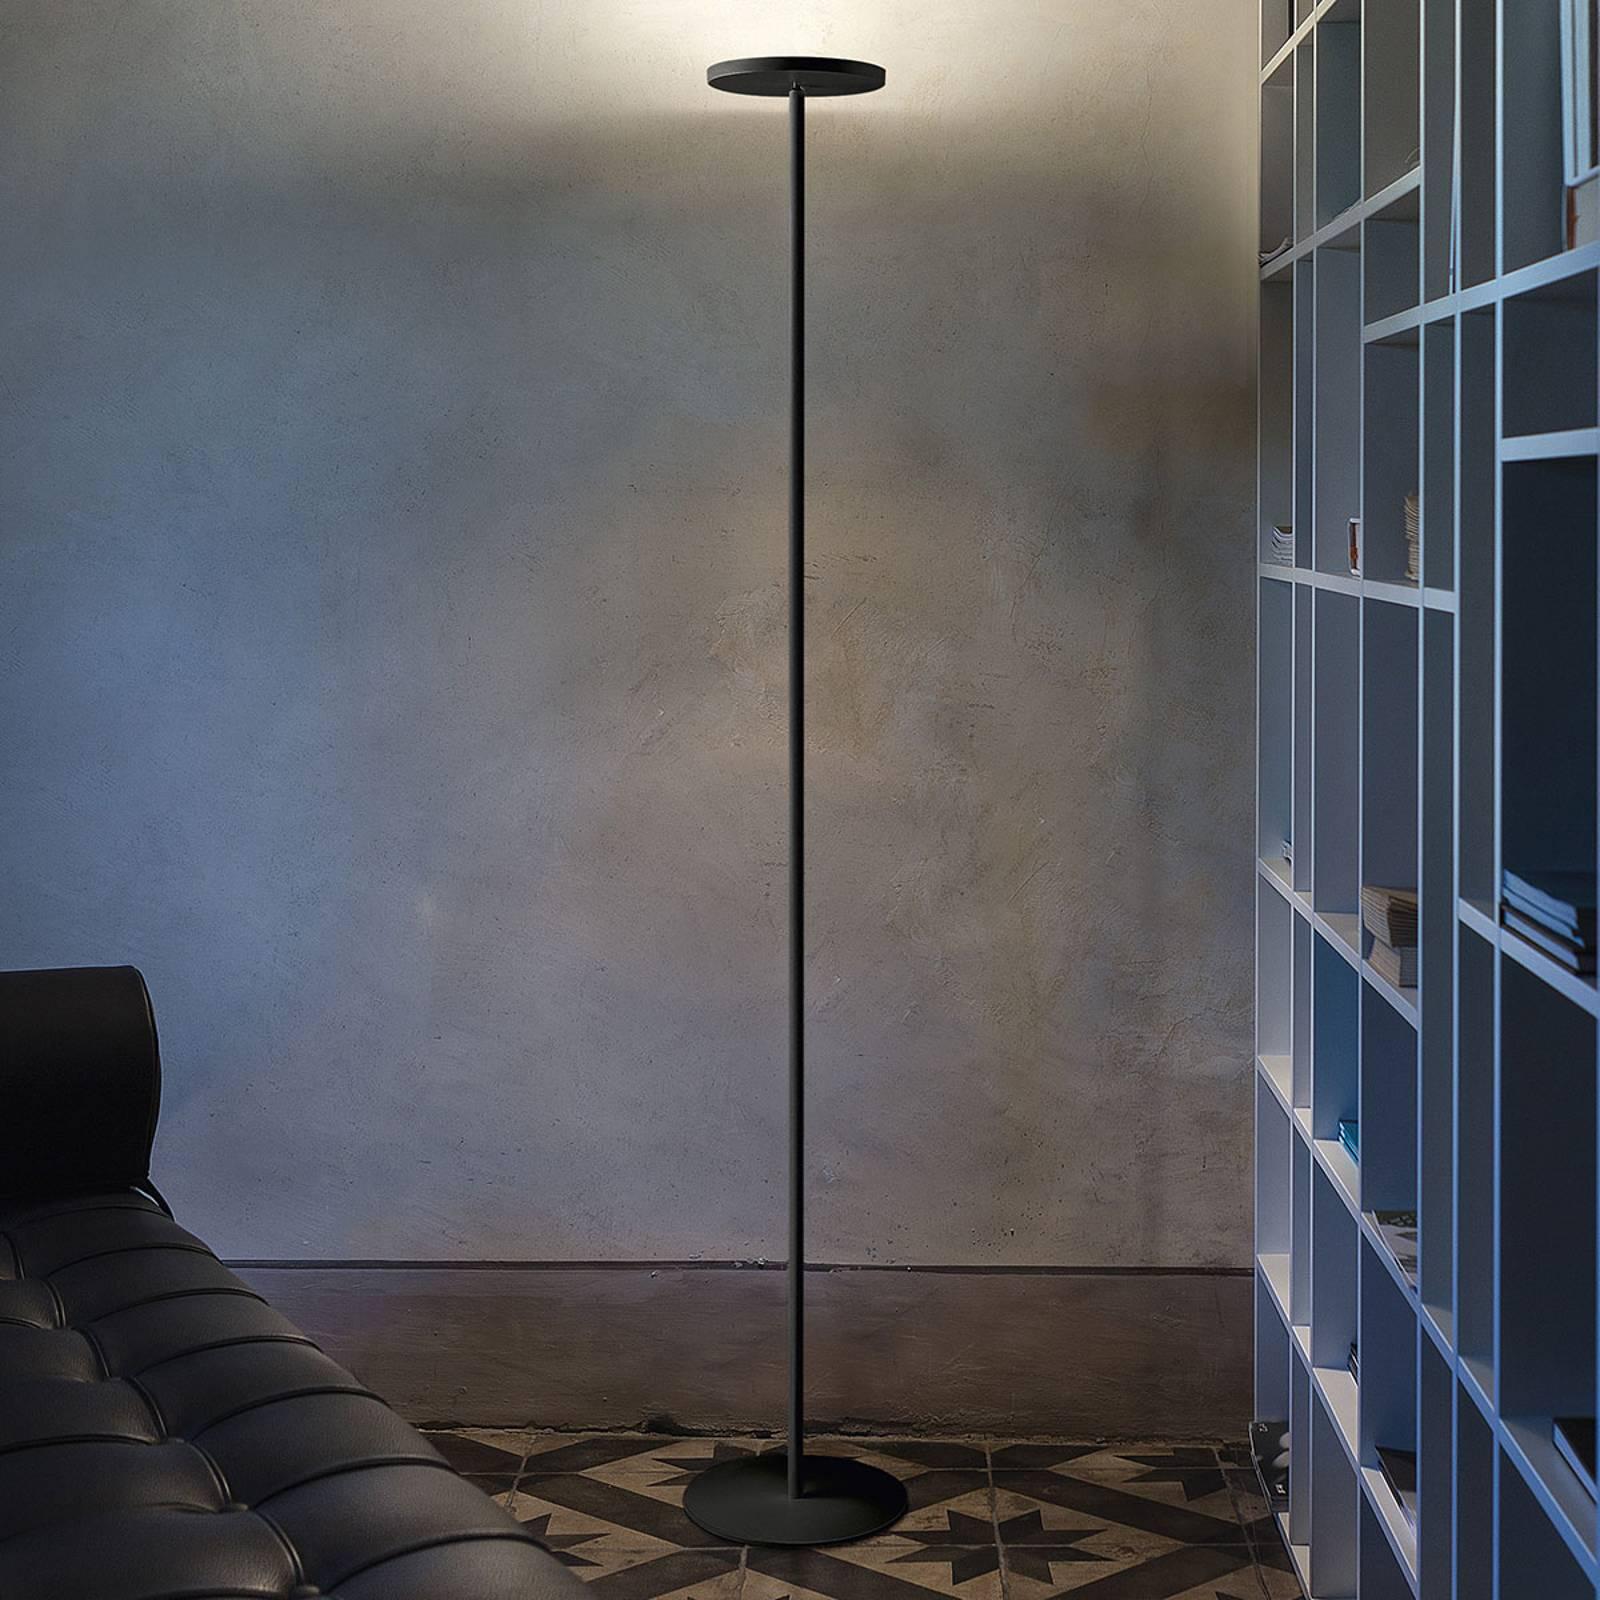 Lampa stojąca LED Joshua, czarna